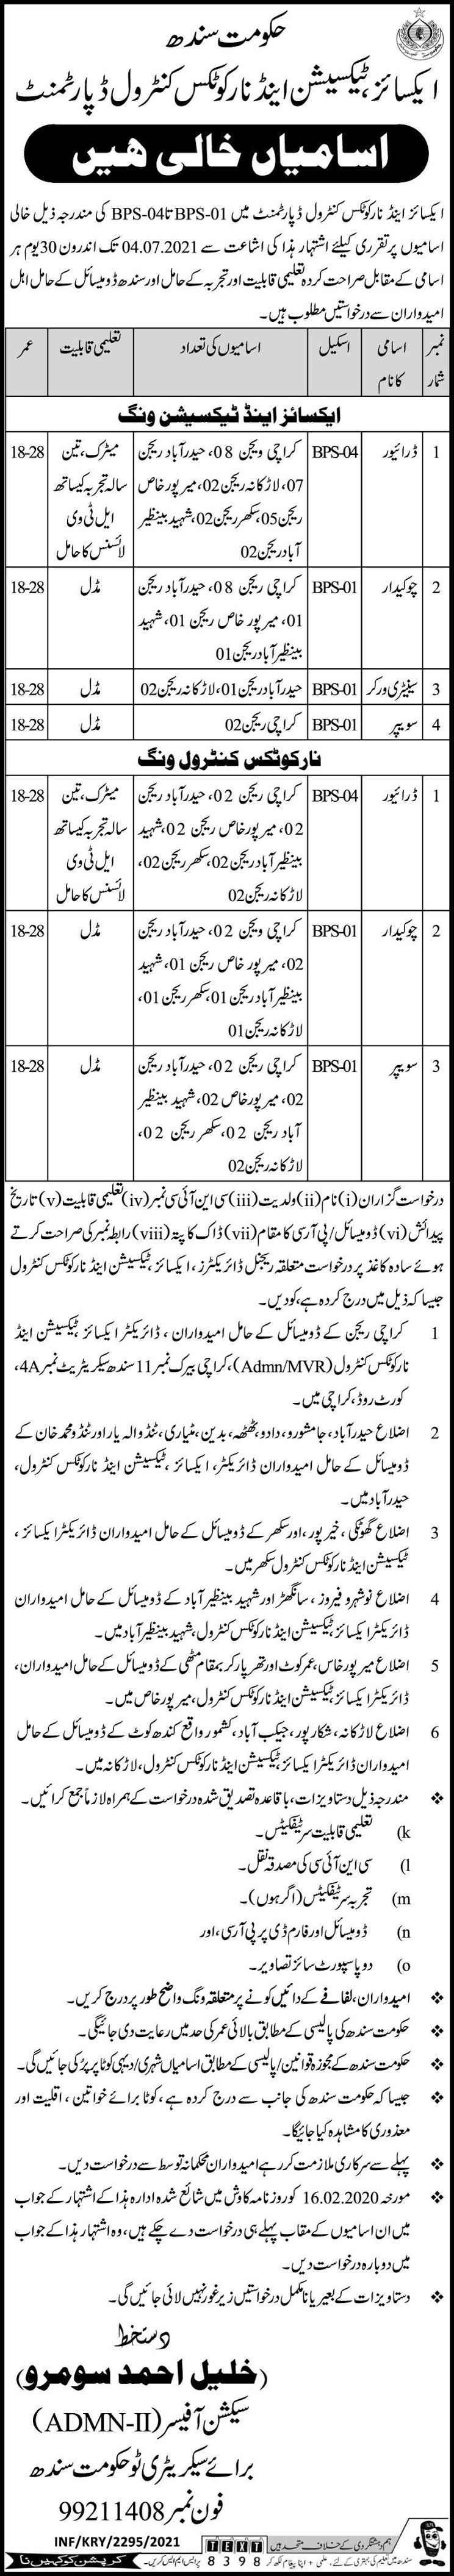 Excise Taxation & Narcotics Control Department Jobs Sindh Karachi 2021